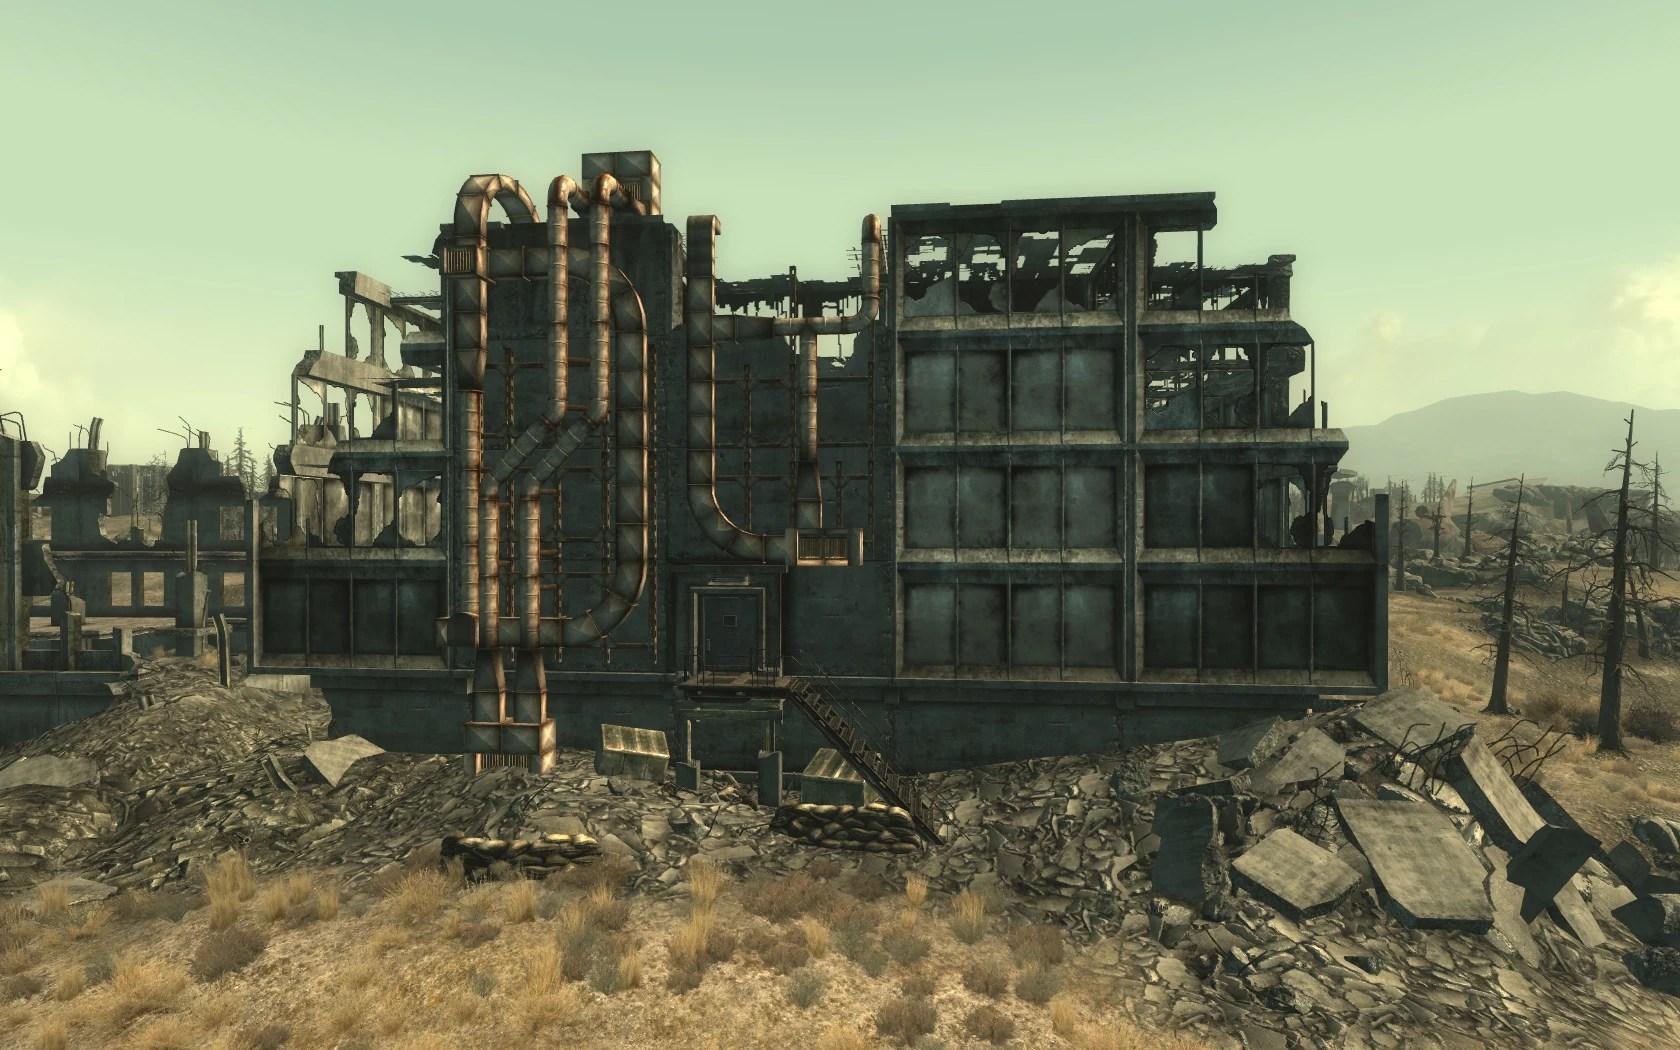 Talon Company Camp Fallout Wiki FANDOM Powered By Wikia